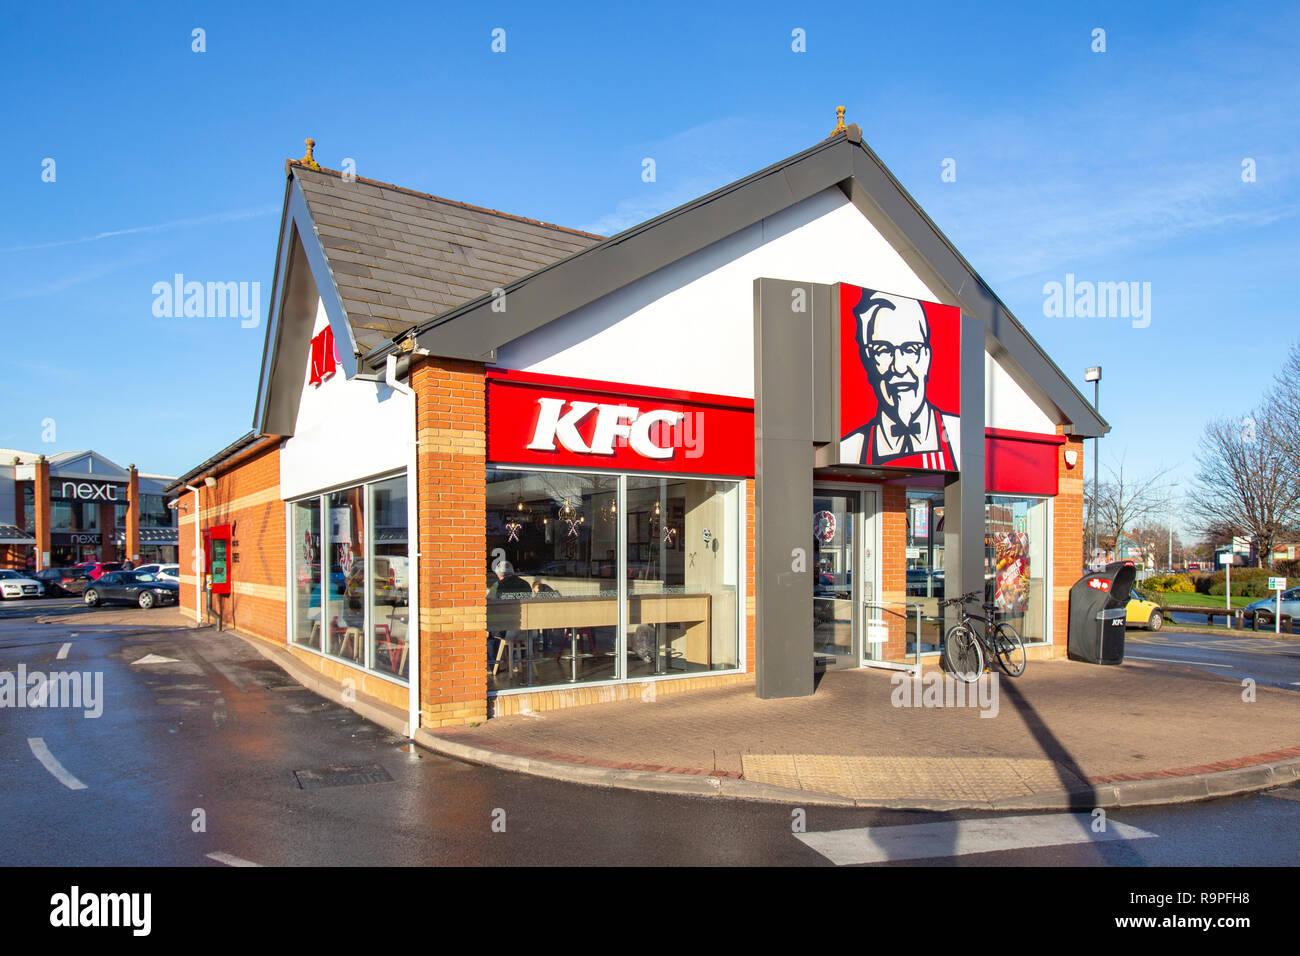 KFC restaurant takeaway at Grand Junction Retail Park in Crewe Cheshire UK - Stock Image